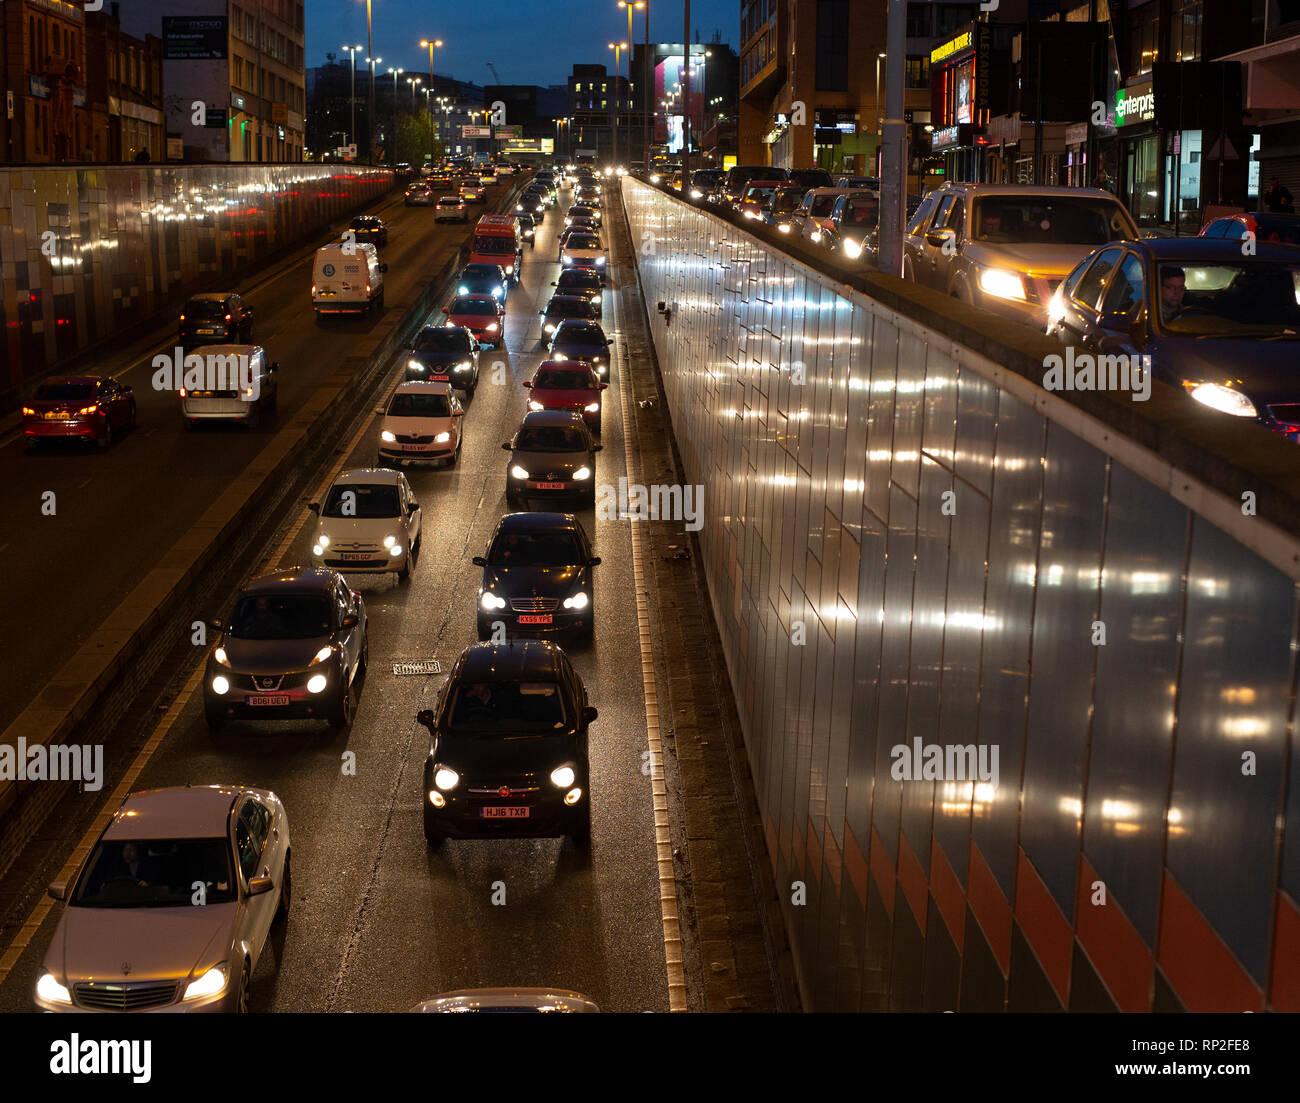 Rush hour traffic in Birmingham city centre, UK - Stock Image